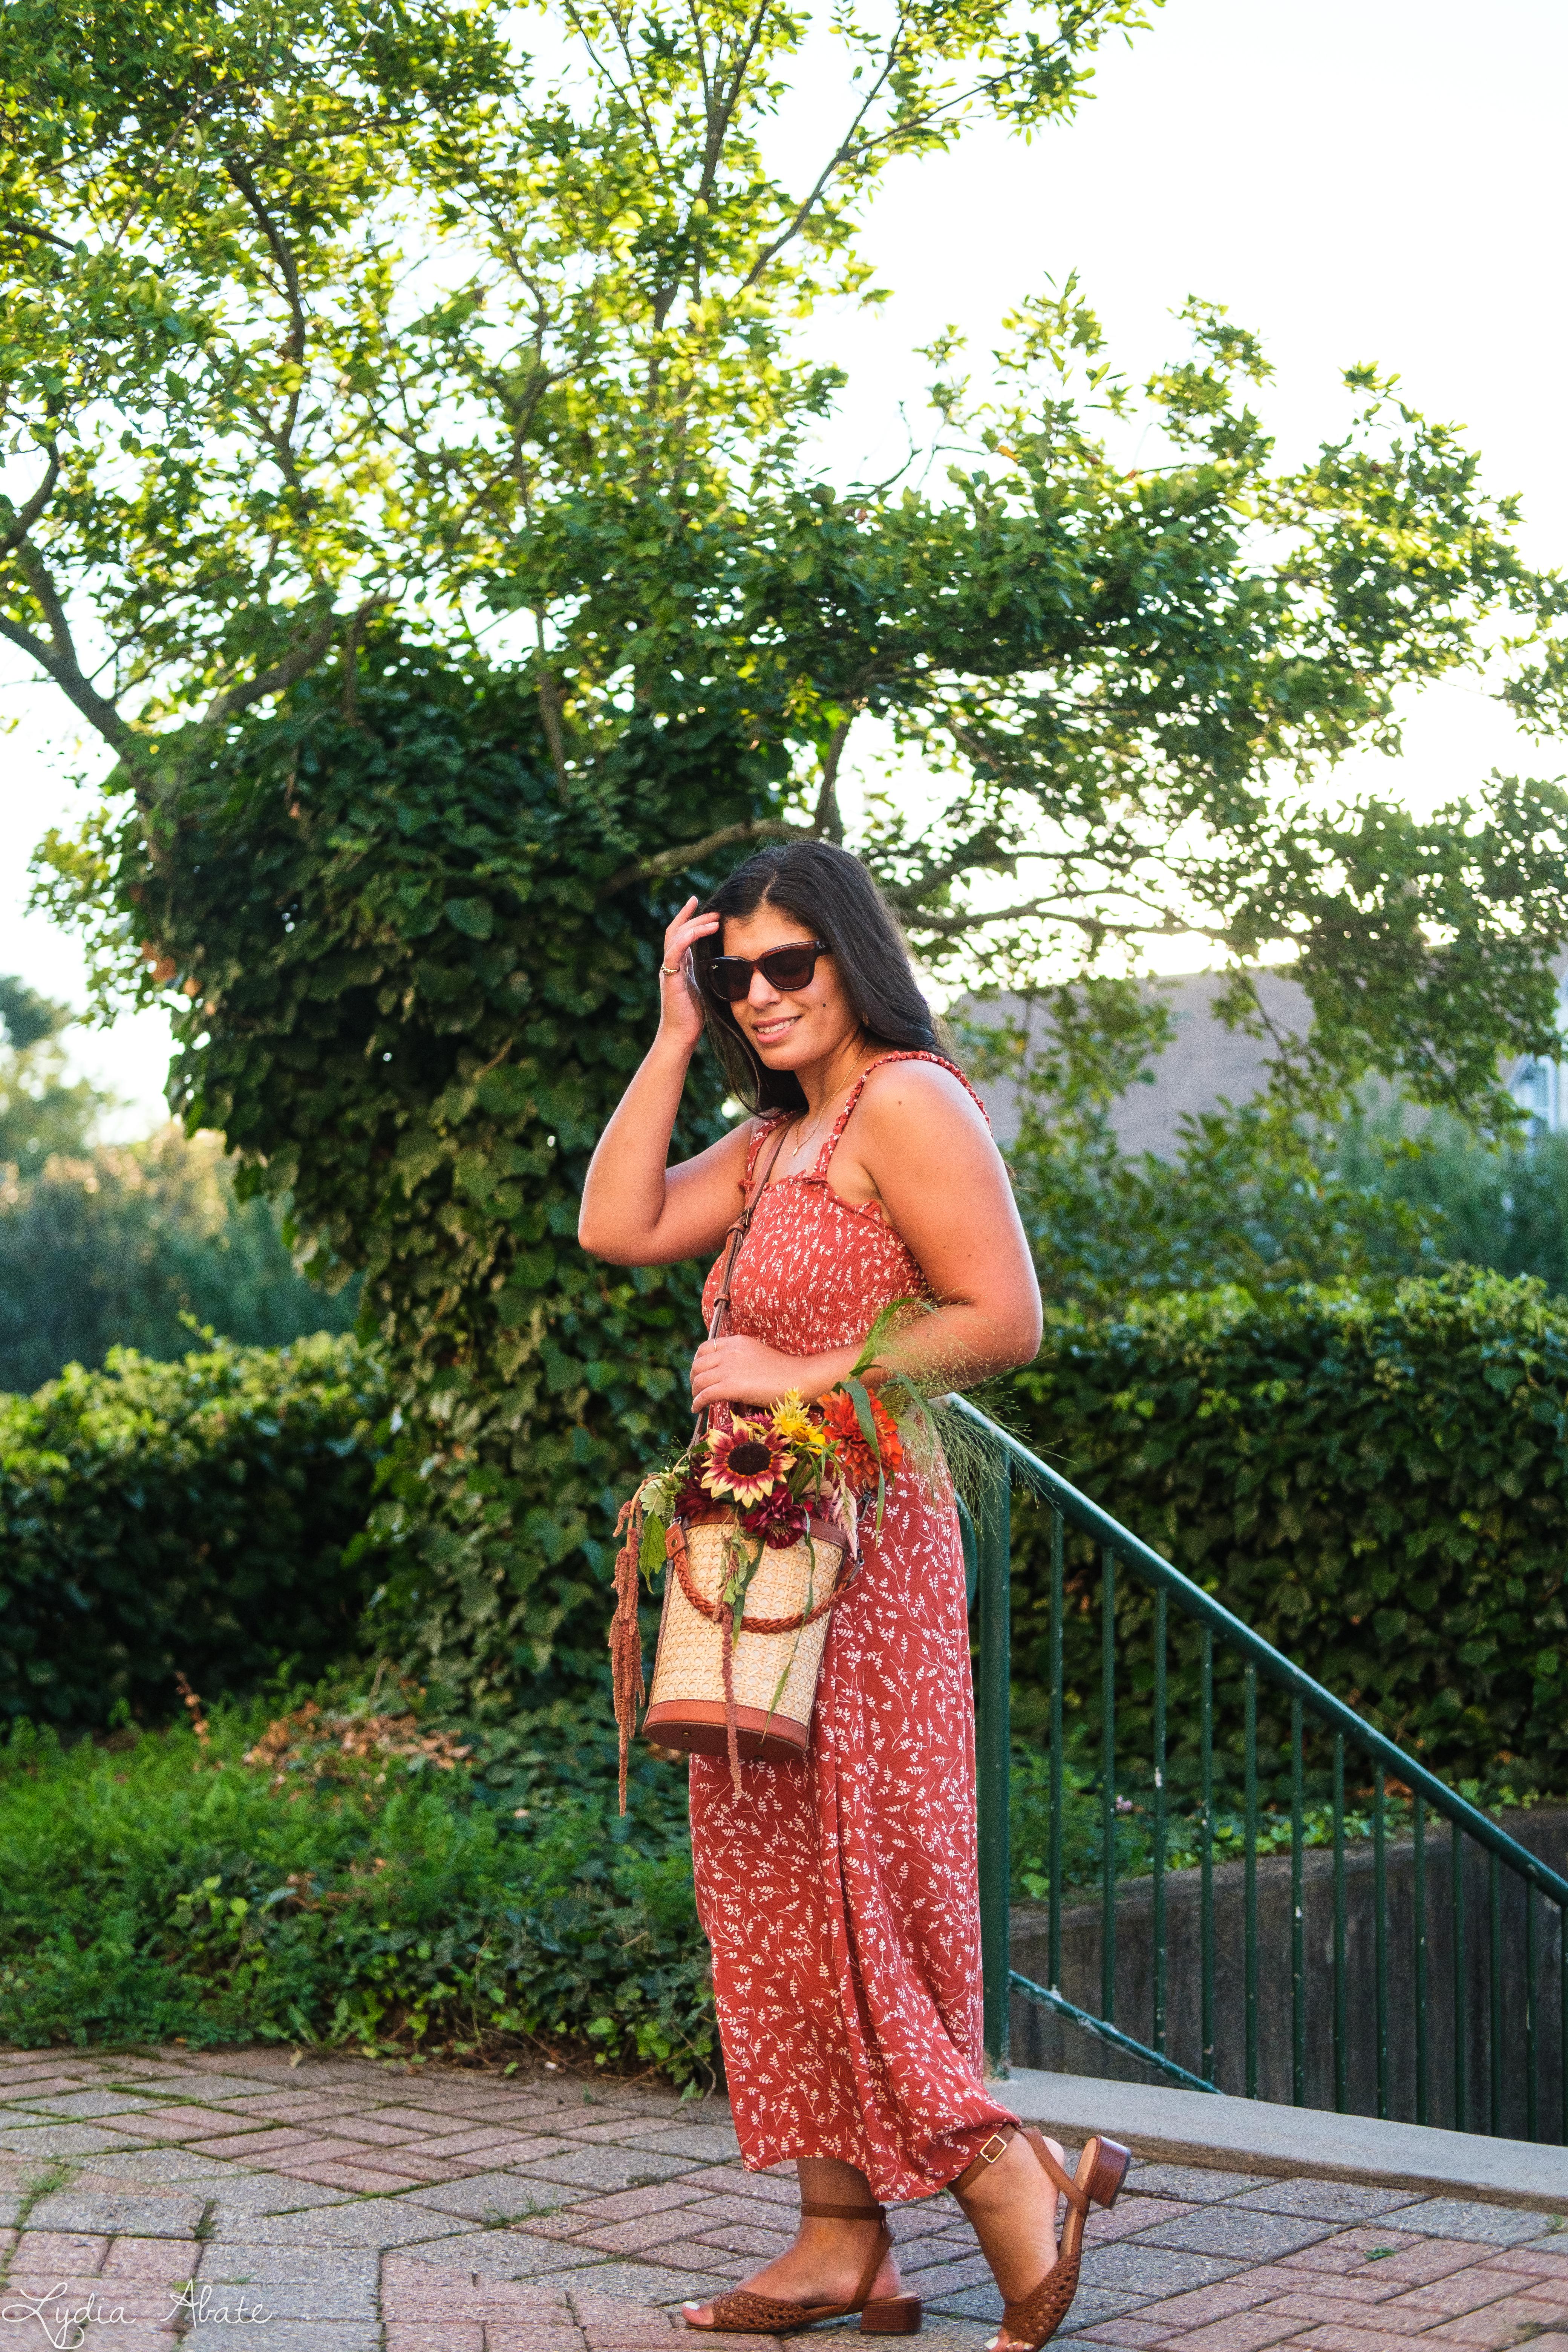 shirred rust floral maxi dress, caned bucket bag, brown sandals-9.jpg